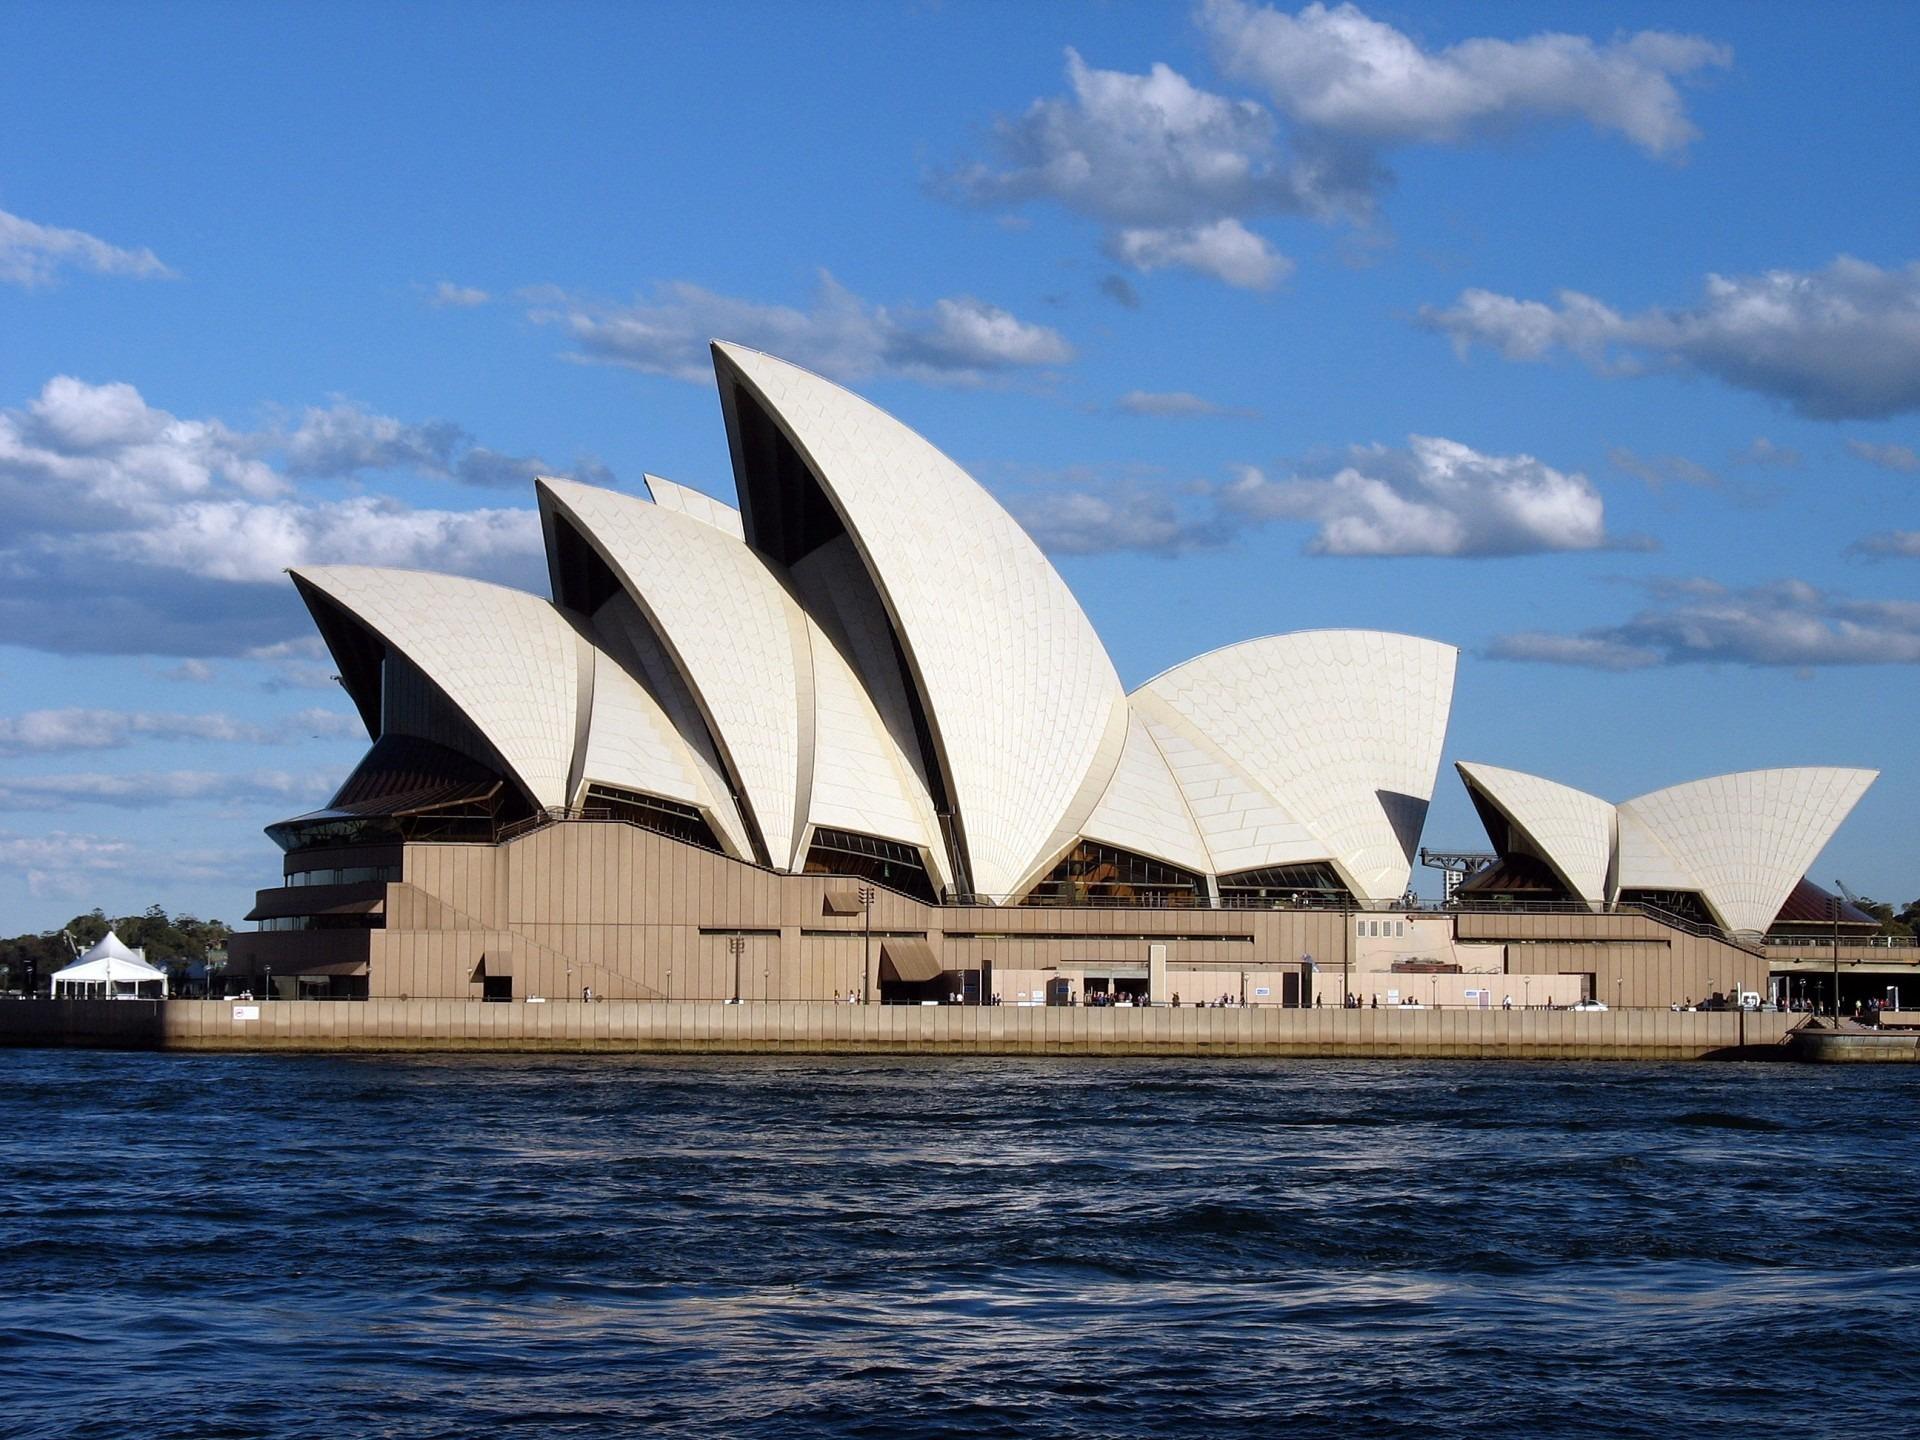 Sea Ocean Architecture Sky House Wind Building Travel Sydney Opera Landmark Harbor Harbour Sightseeing